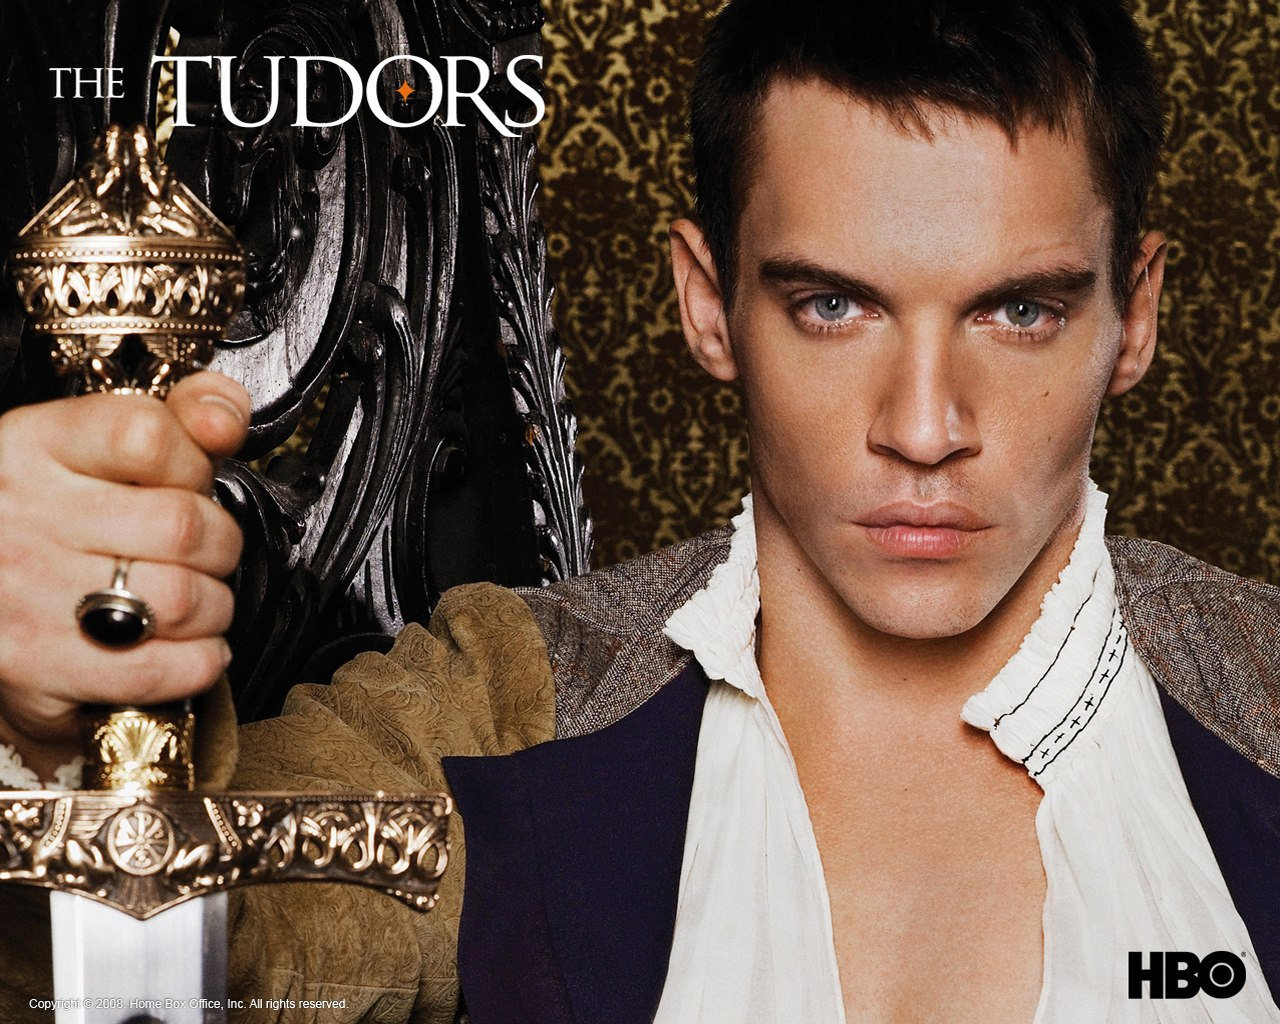 http://3.bp.blogspot.com/_pkHInFn-soI/TD3DpJg3p4I/AAAAAAAAACc/oMKrwZHMto0/s1600/Tudors-Jonathan-Rhys-Meyers-1681.jpg